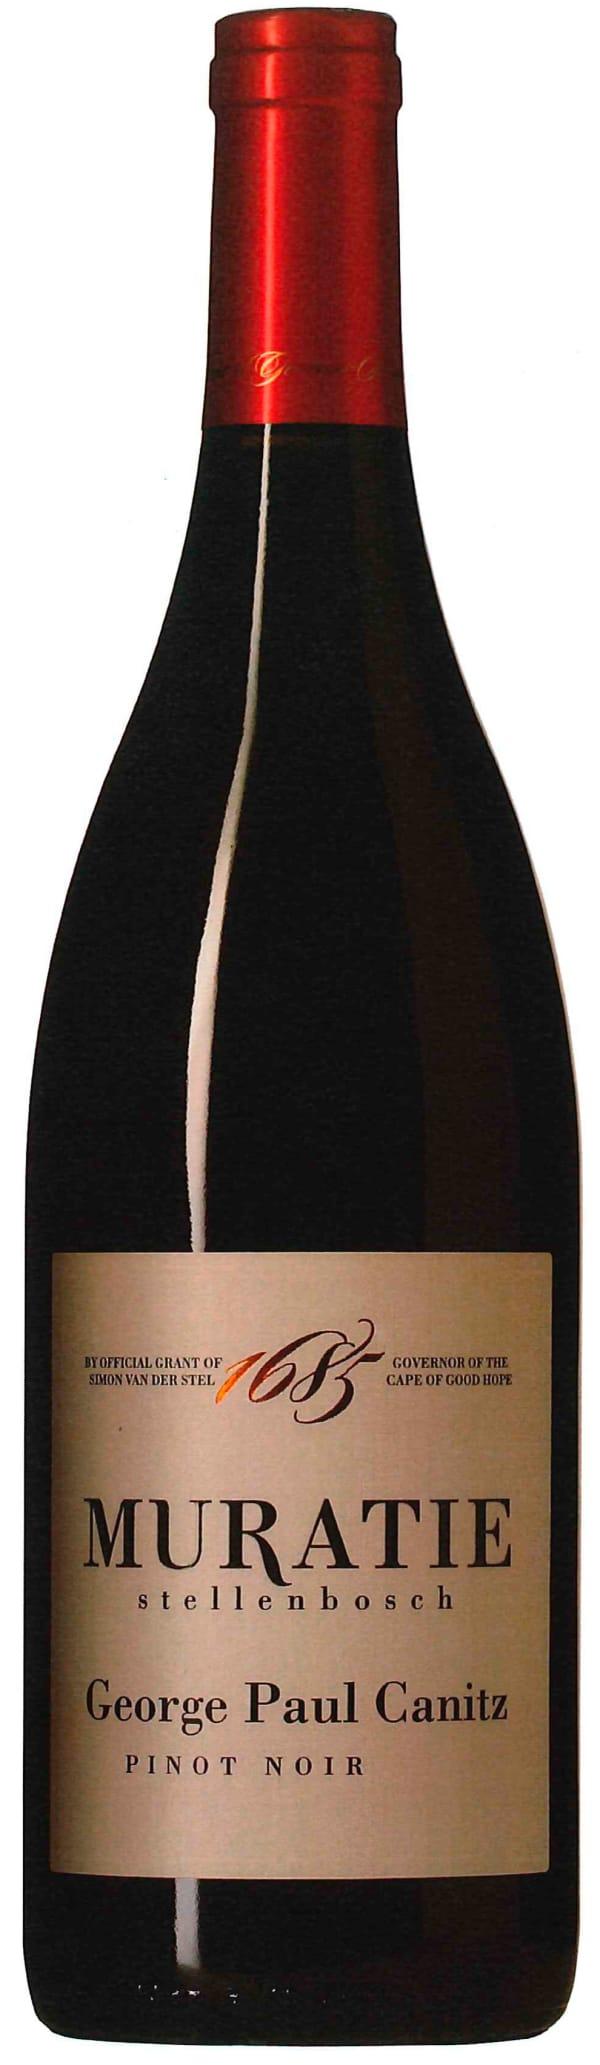 Muratie George Paul Canitz Pinot Noir 2014